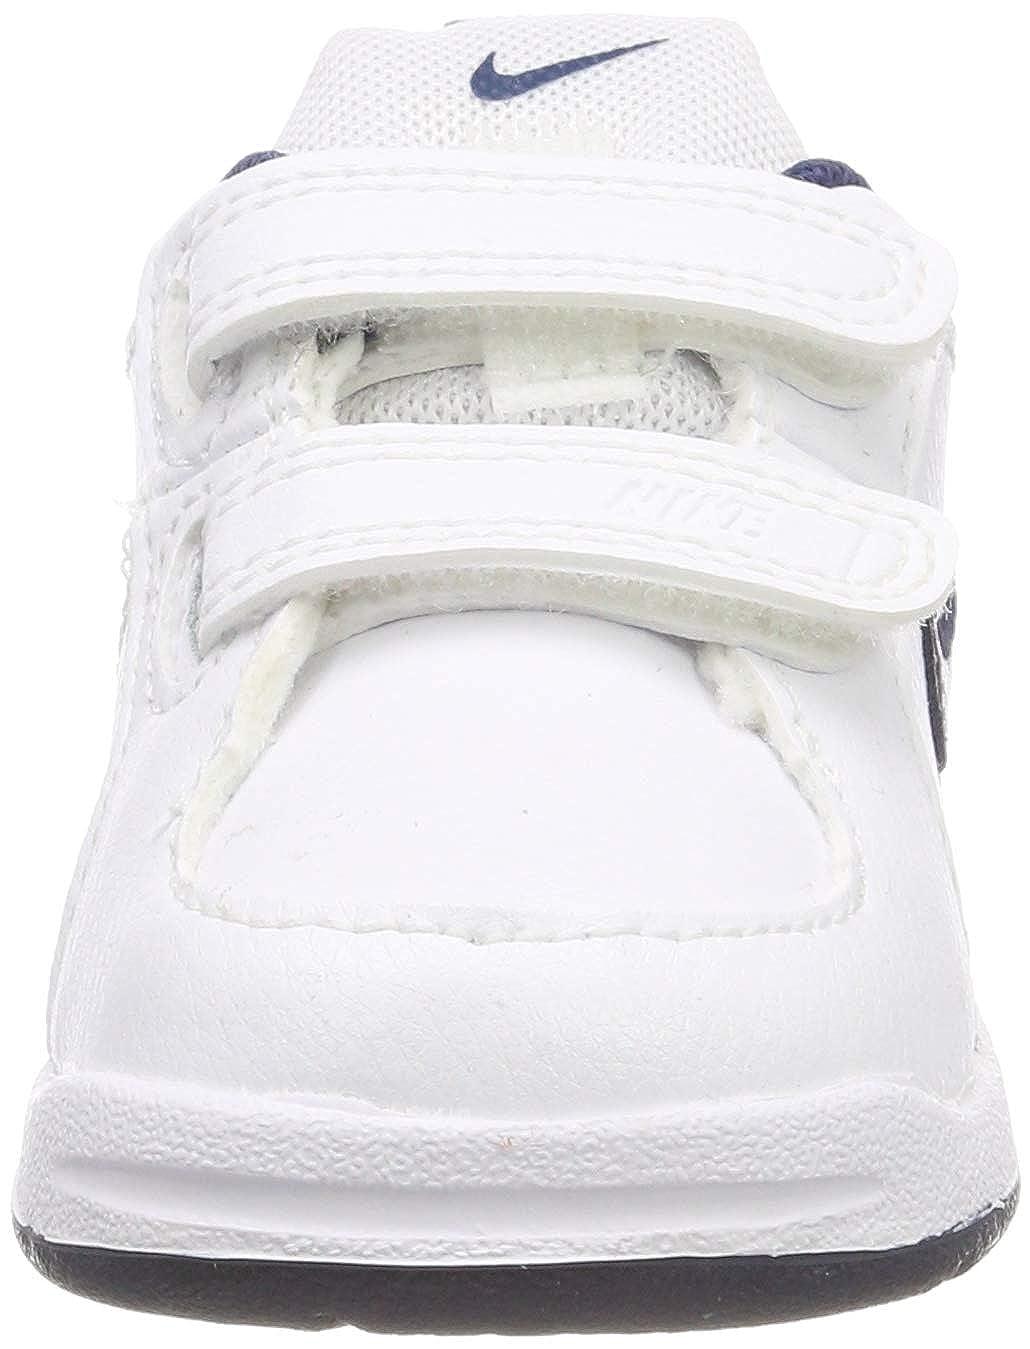 d806e79bc2 Nike Pico 4 (Tdv), Baby Boys' Walking Baby Shoes: Amazon.co.uk: Shoes & Bags